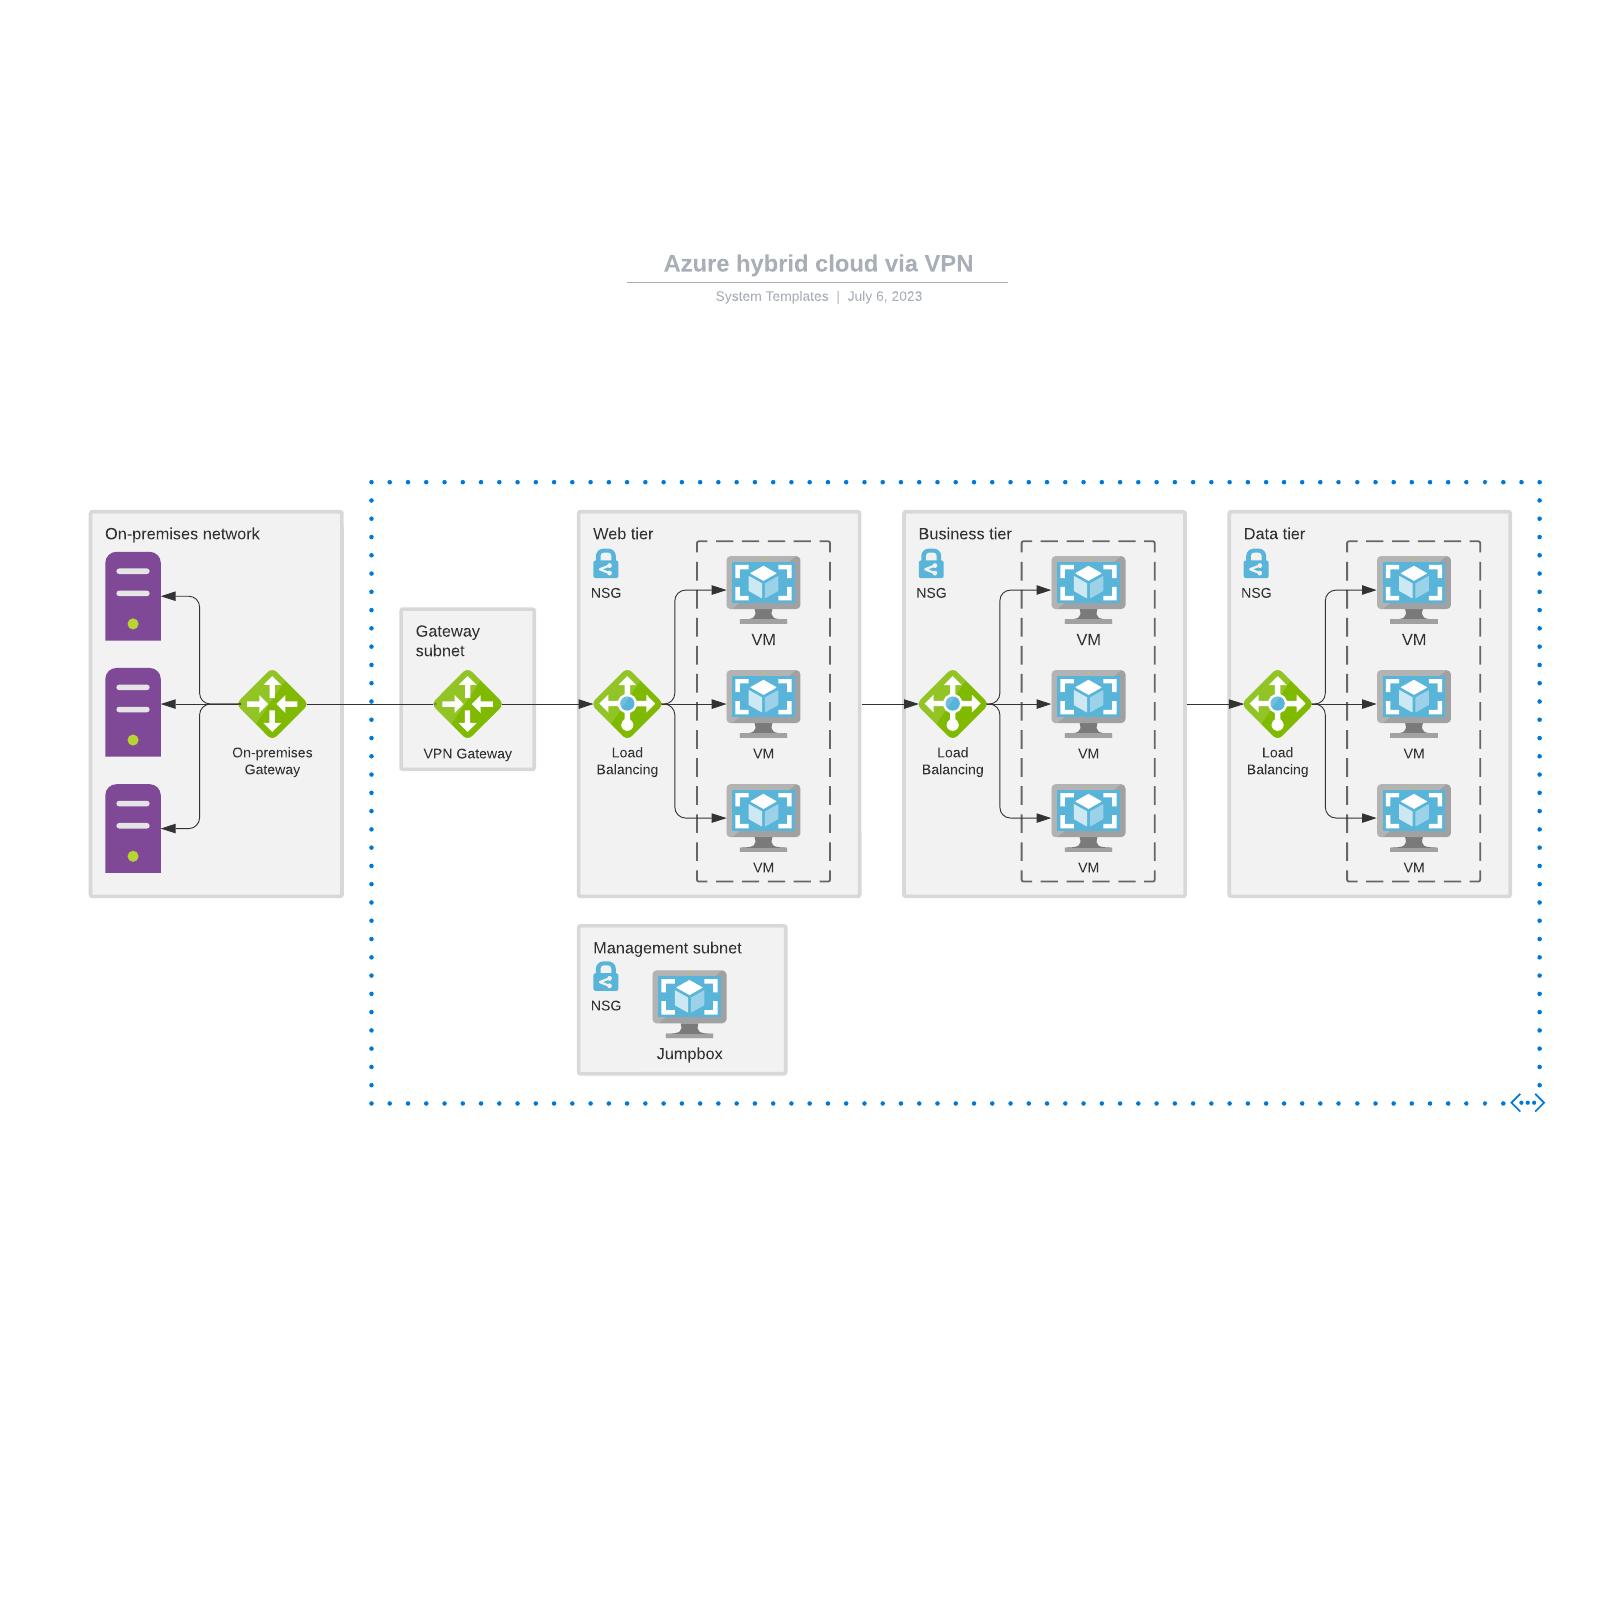 Azure hybrid cloud via VPN